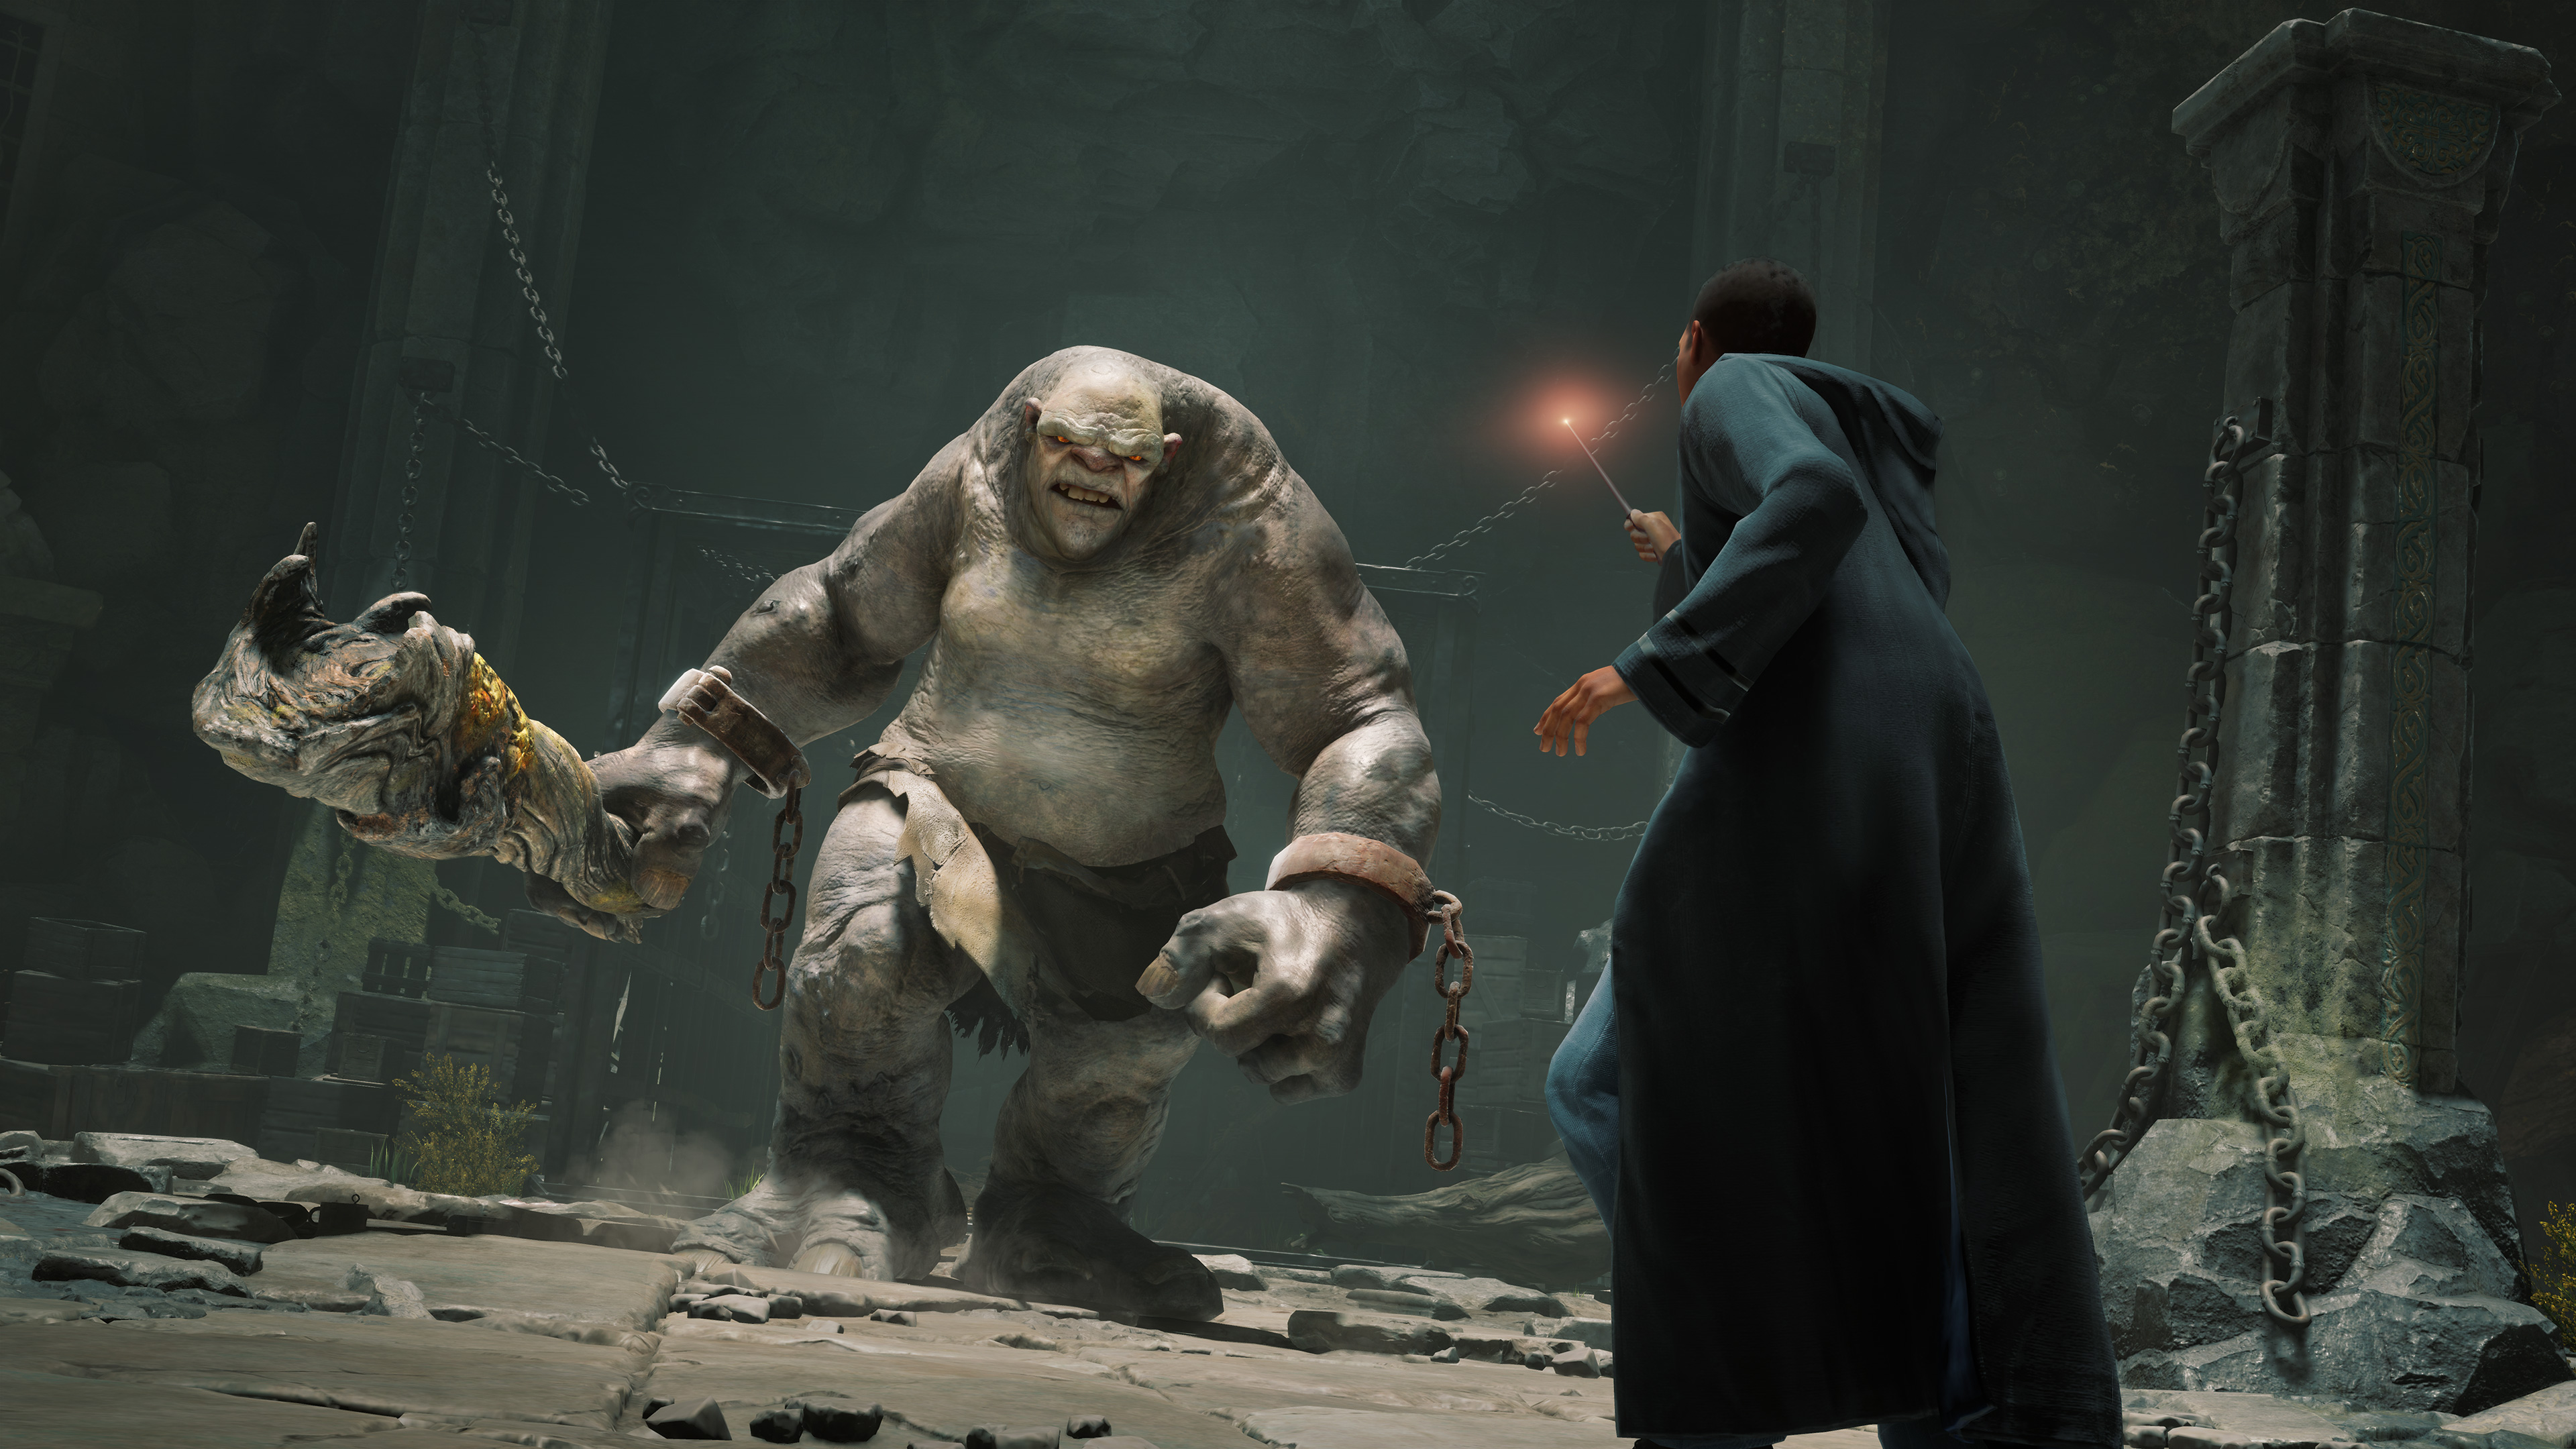 a Hogwarts student brandishes his wand as a troll advances toward him in Hogwarts Legacy